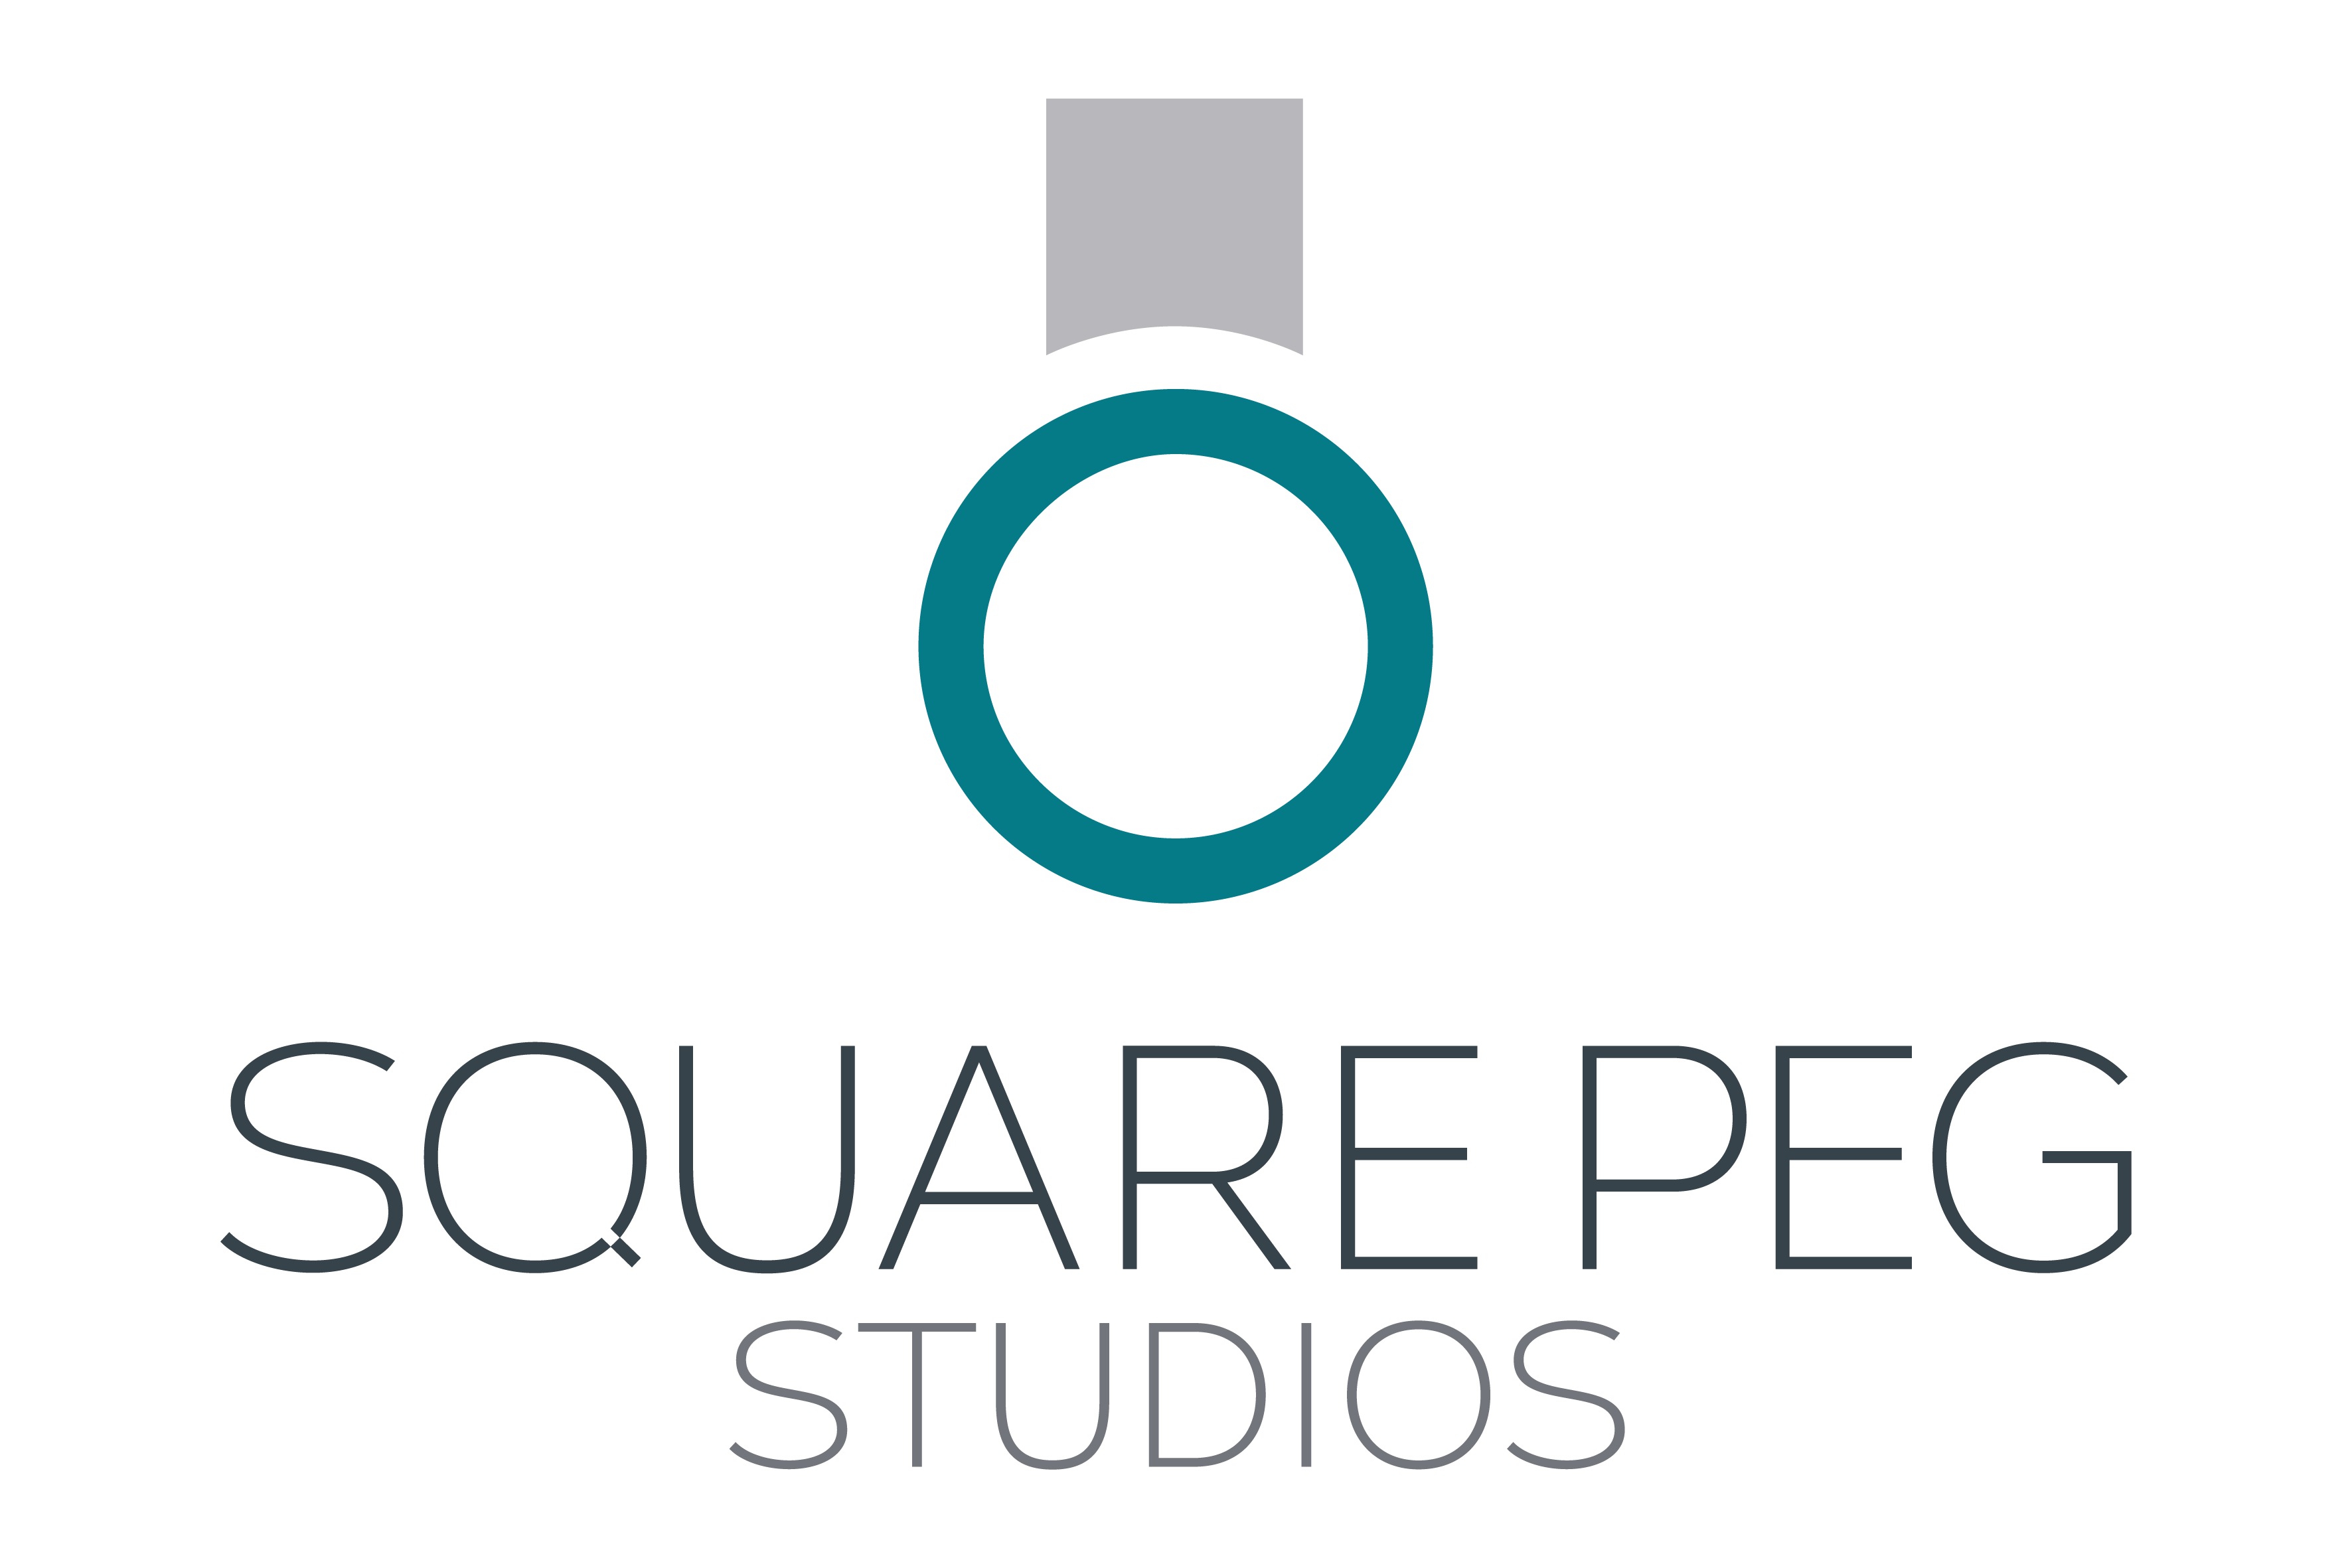 SquarePeg Studios ring logo